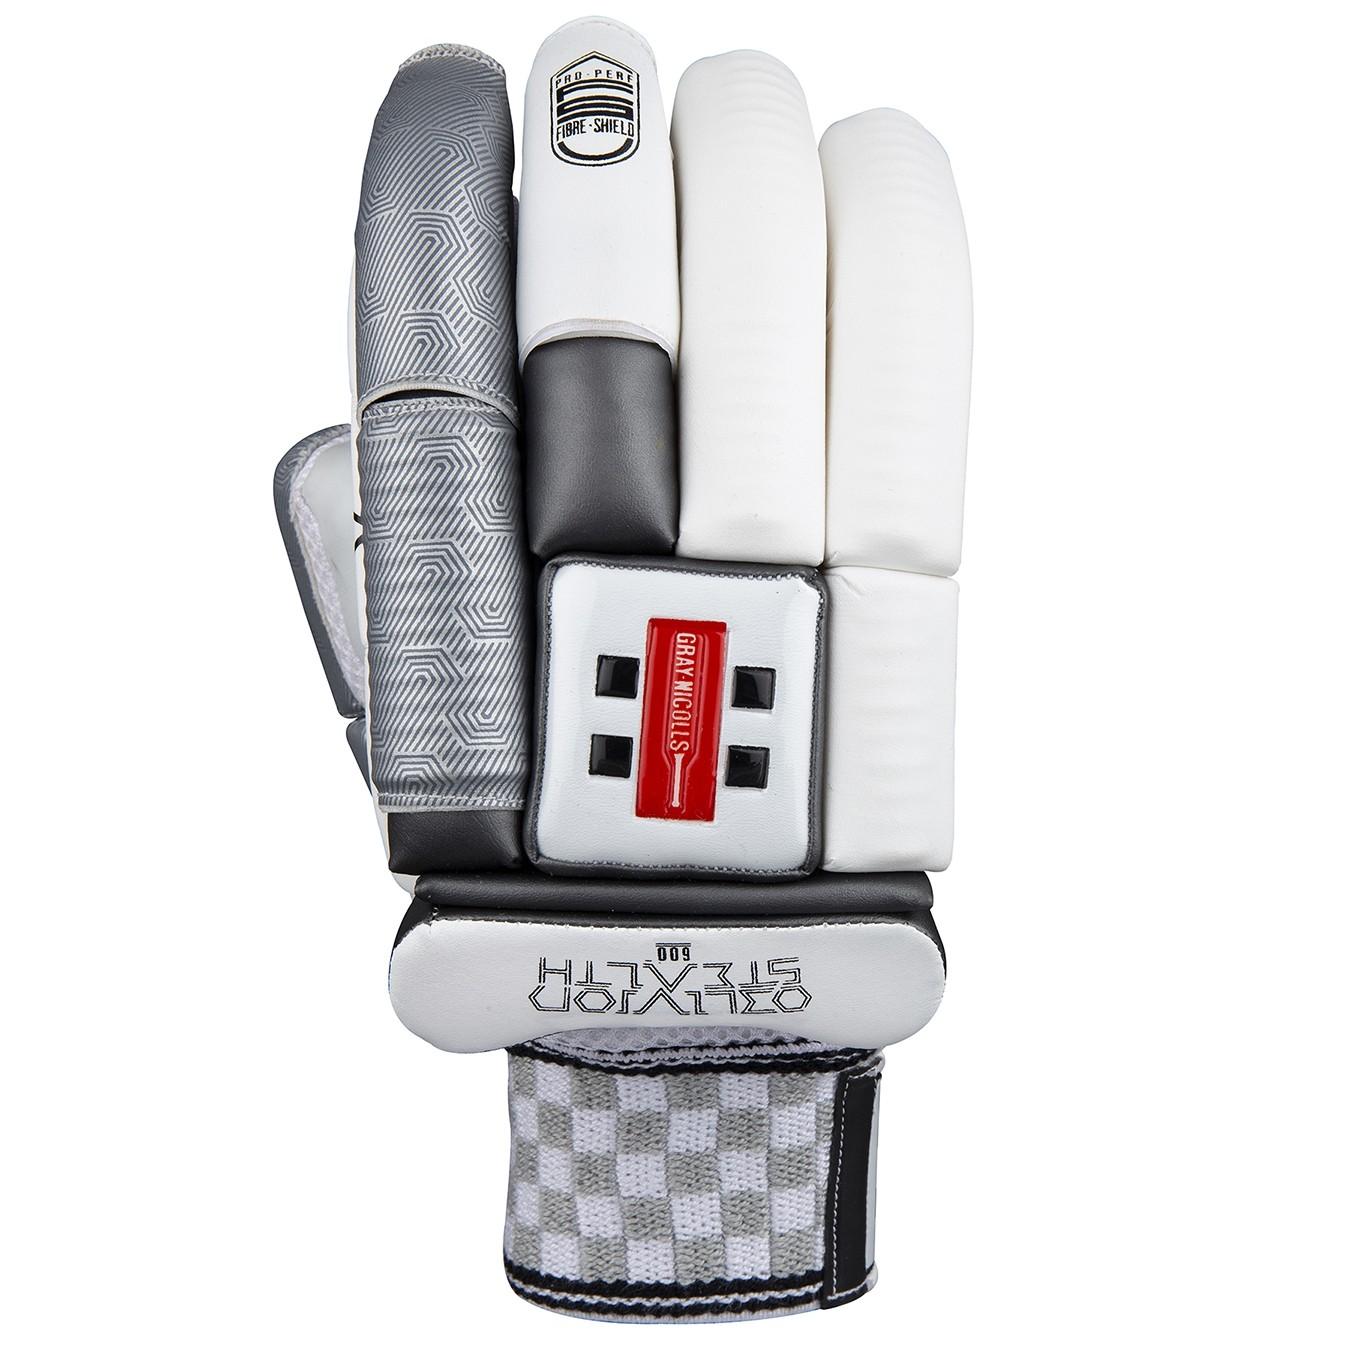 2021 Gray Nicolls Oblivion Stealth 600 Batting Gloves